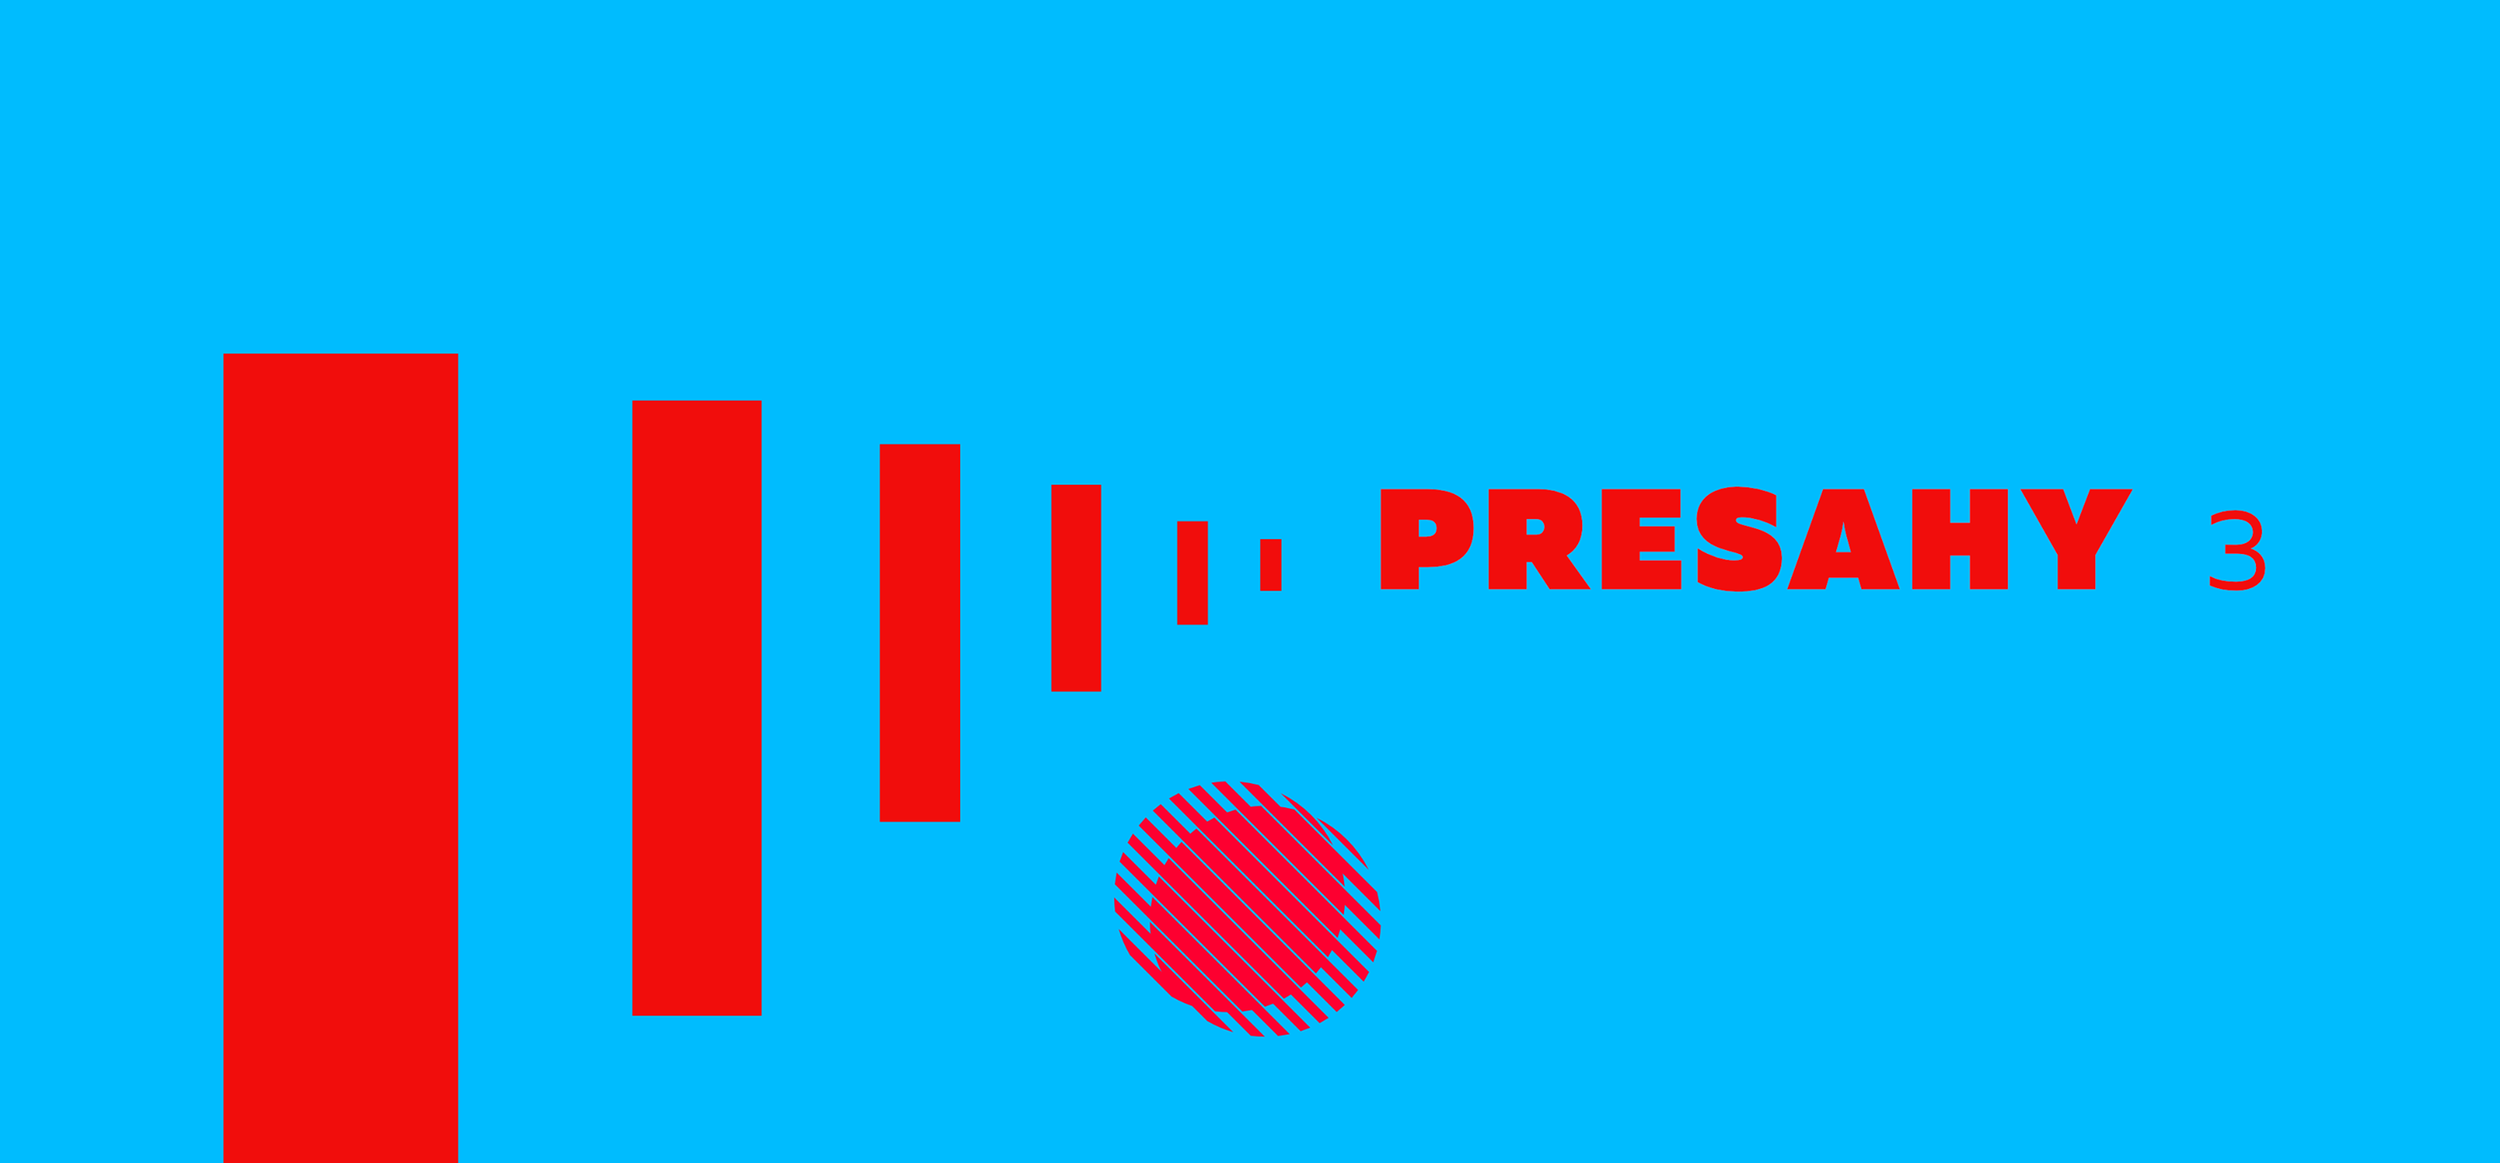 presahy3.jpg